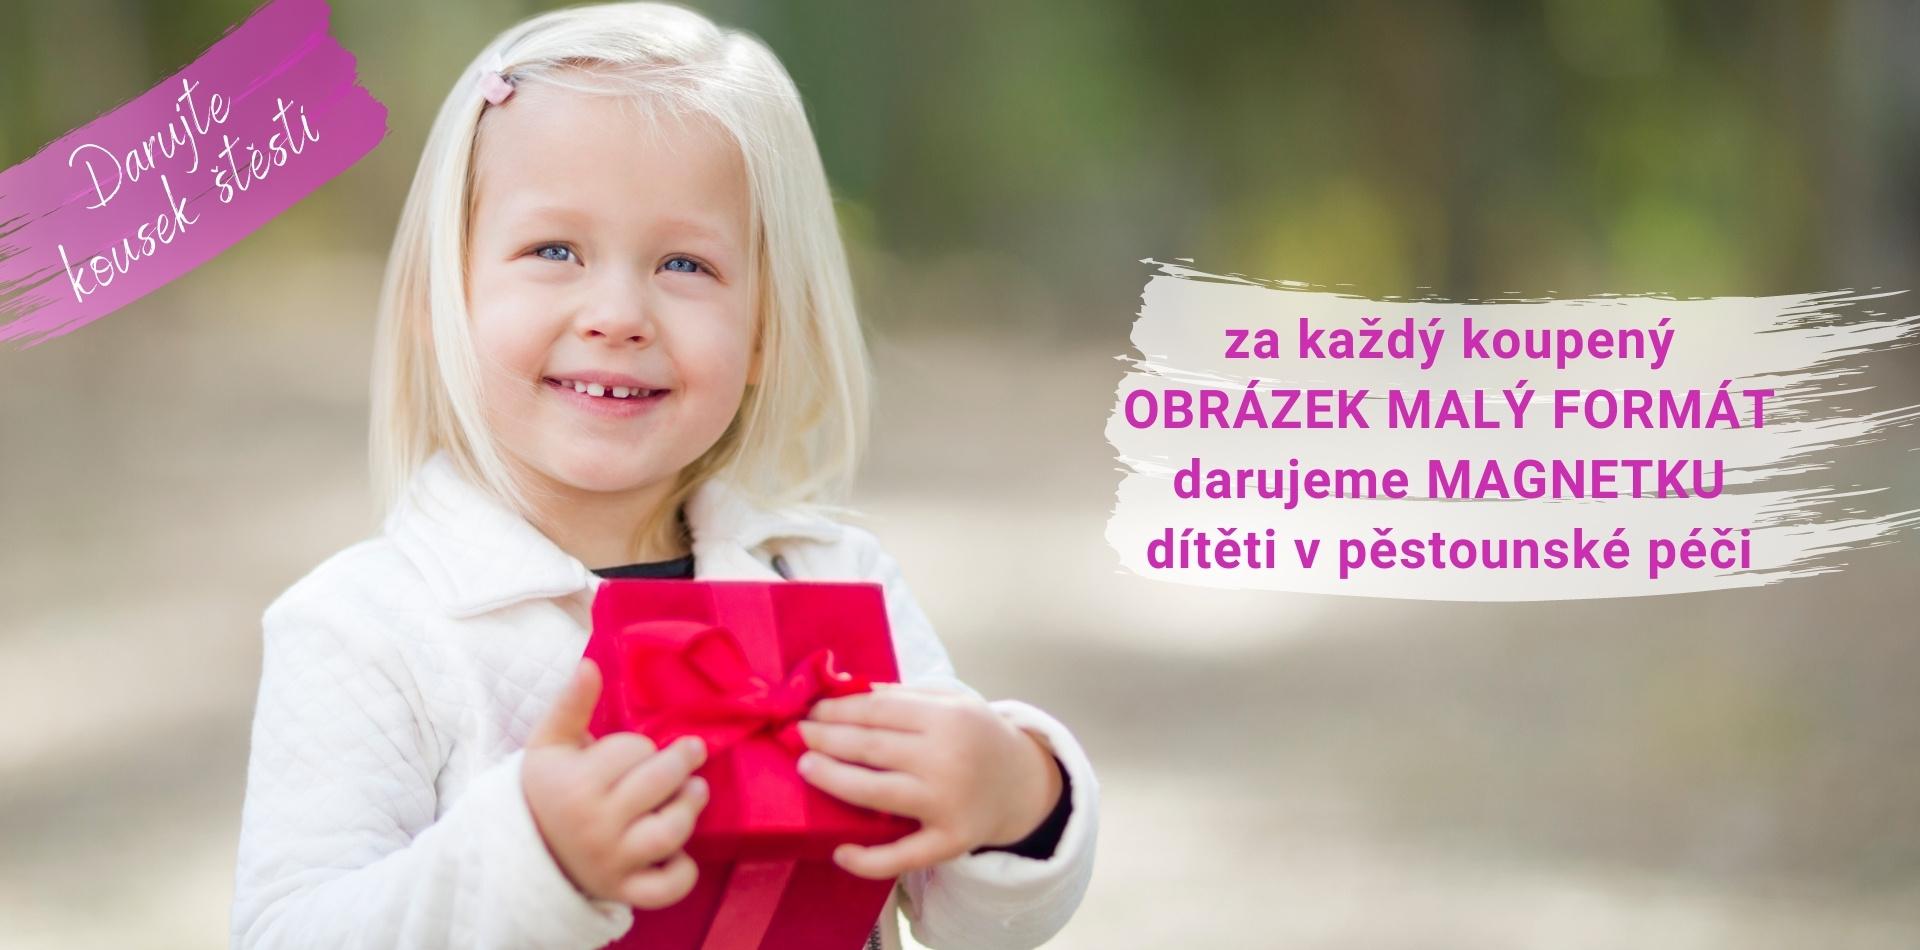 Tvorimesrdcem-blog-darujte-kousek-stesti_1